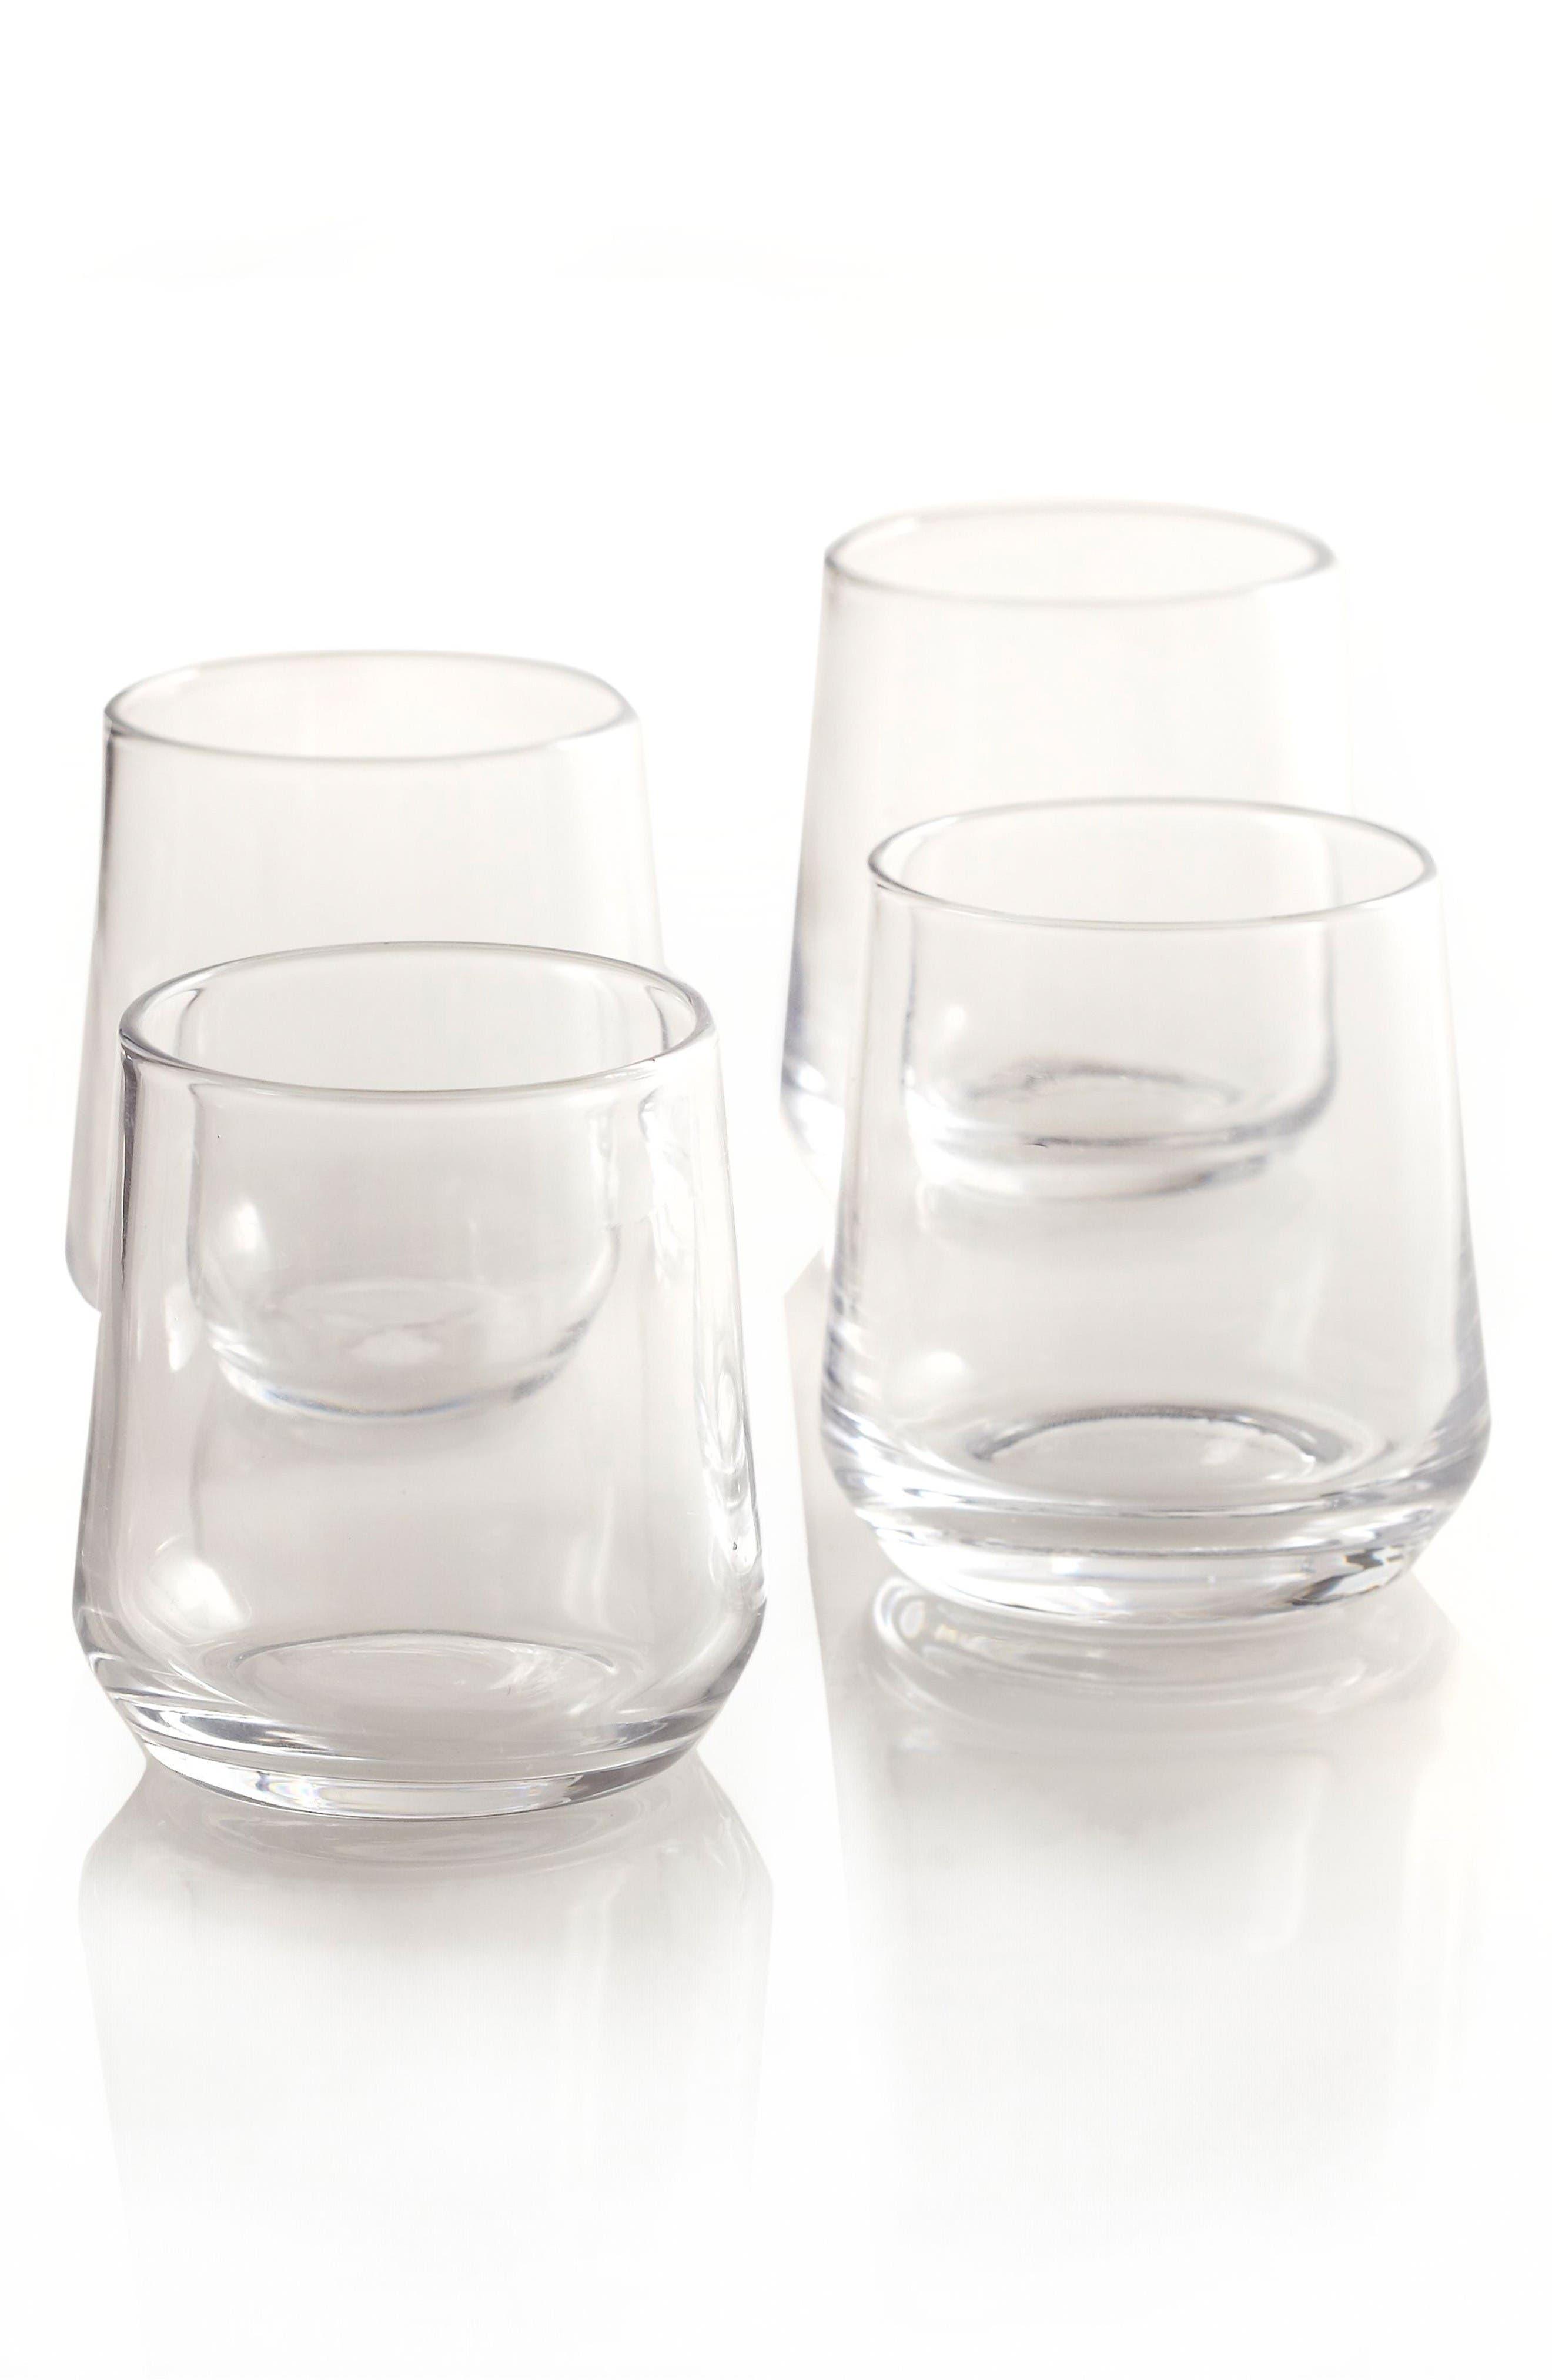 Set of 12 Tasting Glasses,                             Main thumbnail 1, color,                             Clear